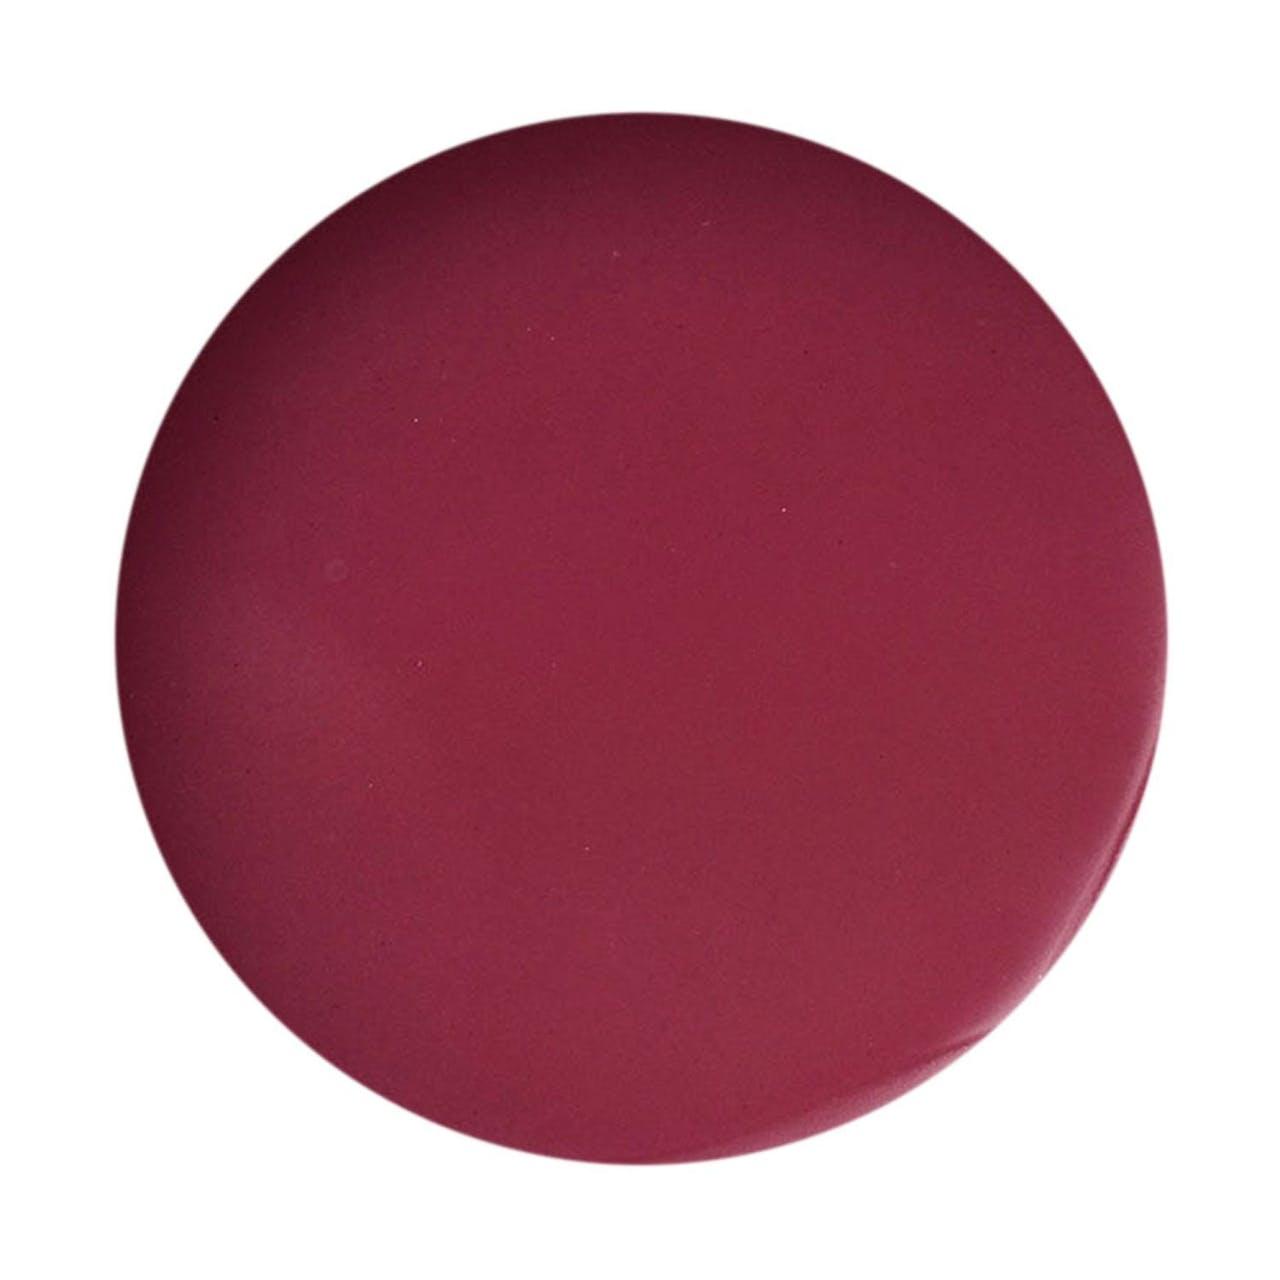 Cremepigment Knutsch Refill 3g - 1.66€/1g